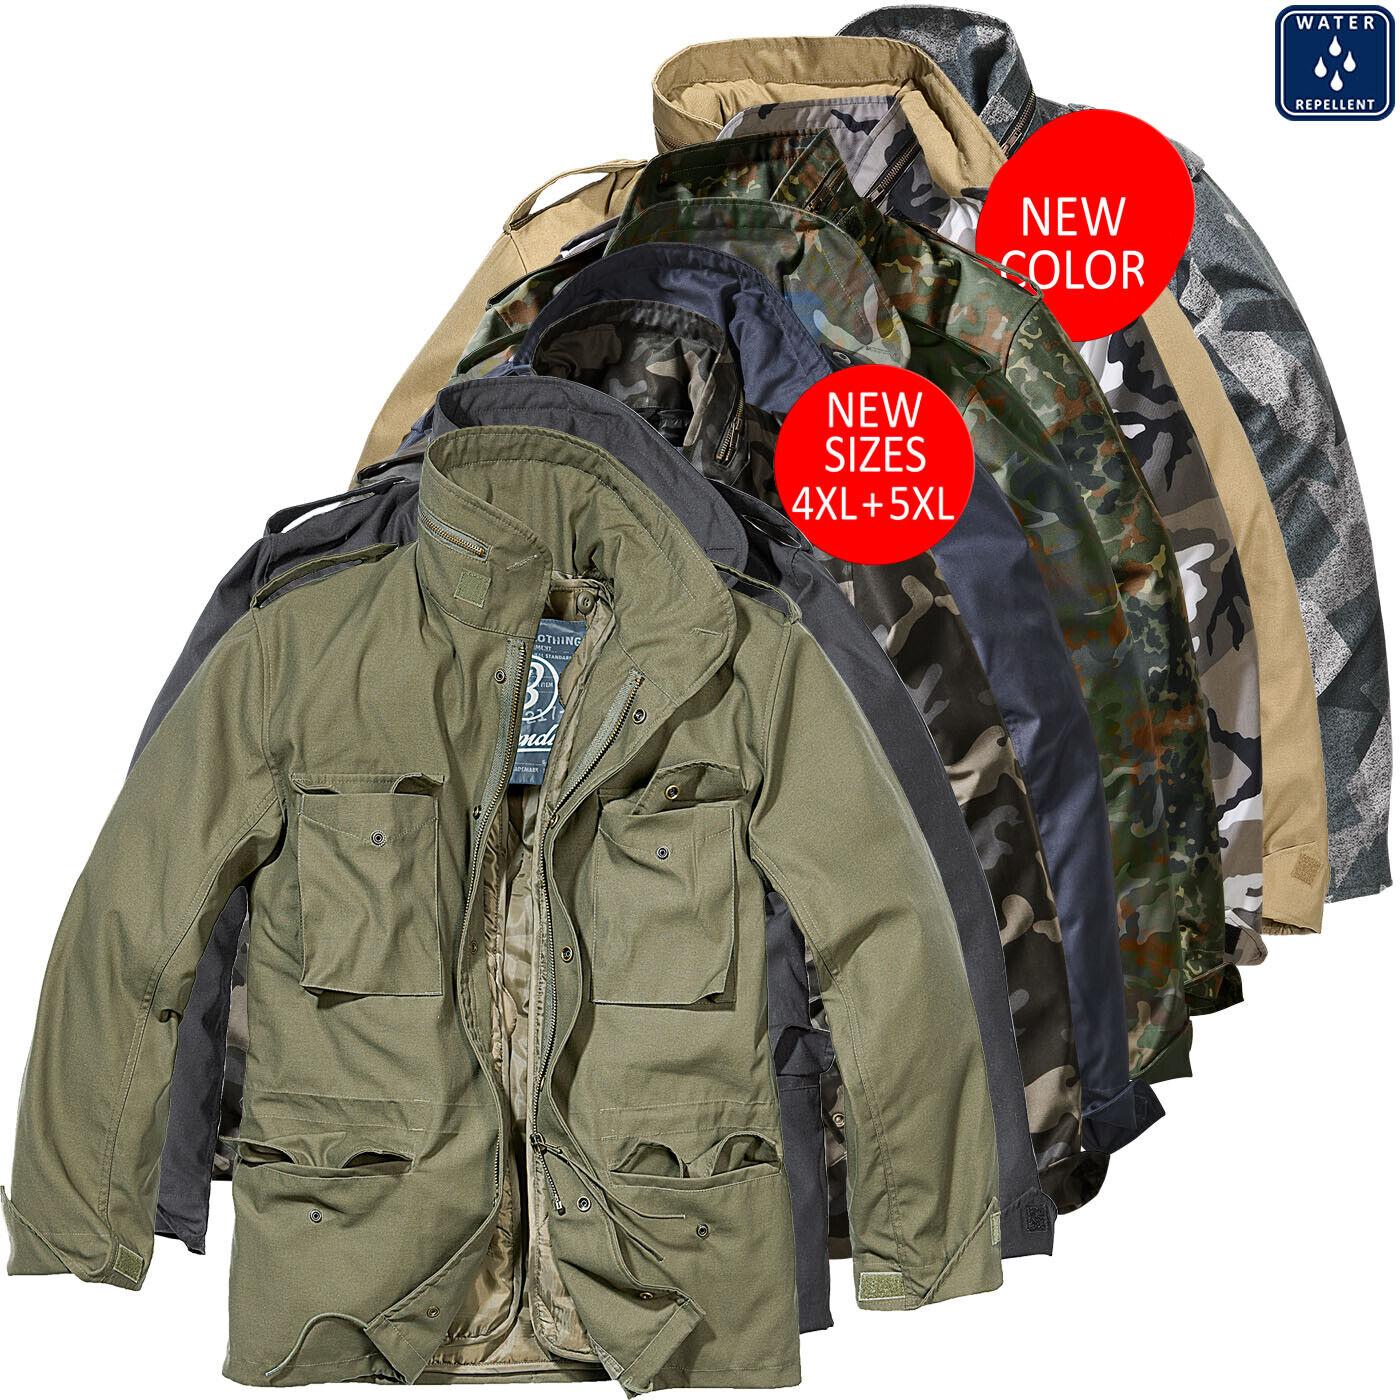 Brandit M65 Jacket Camel M65 Jackets Clothing